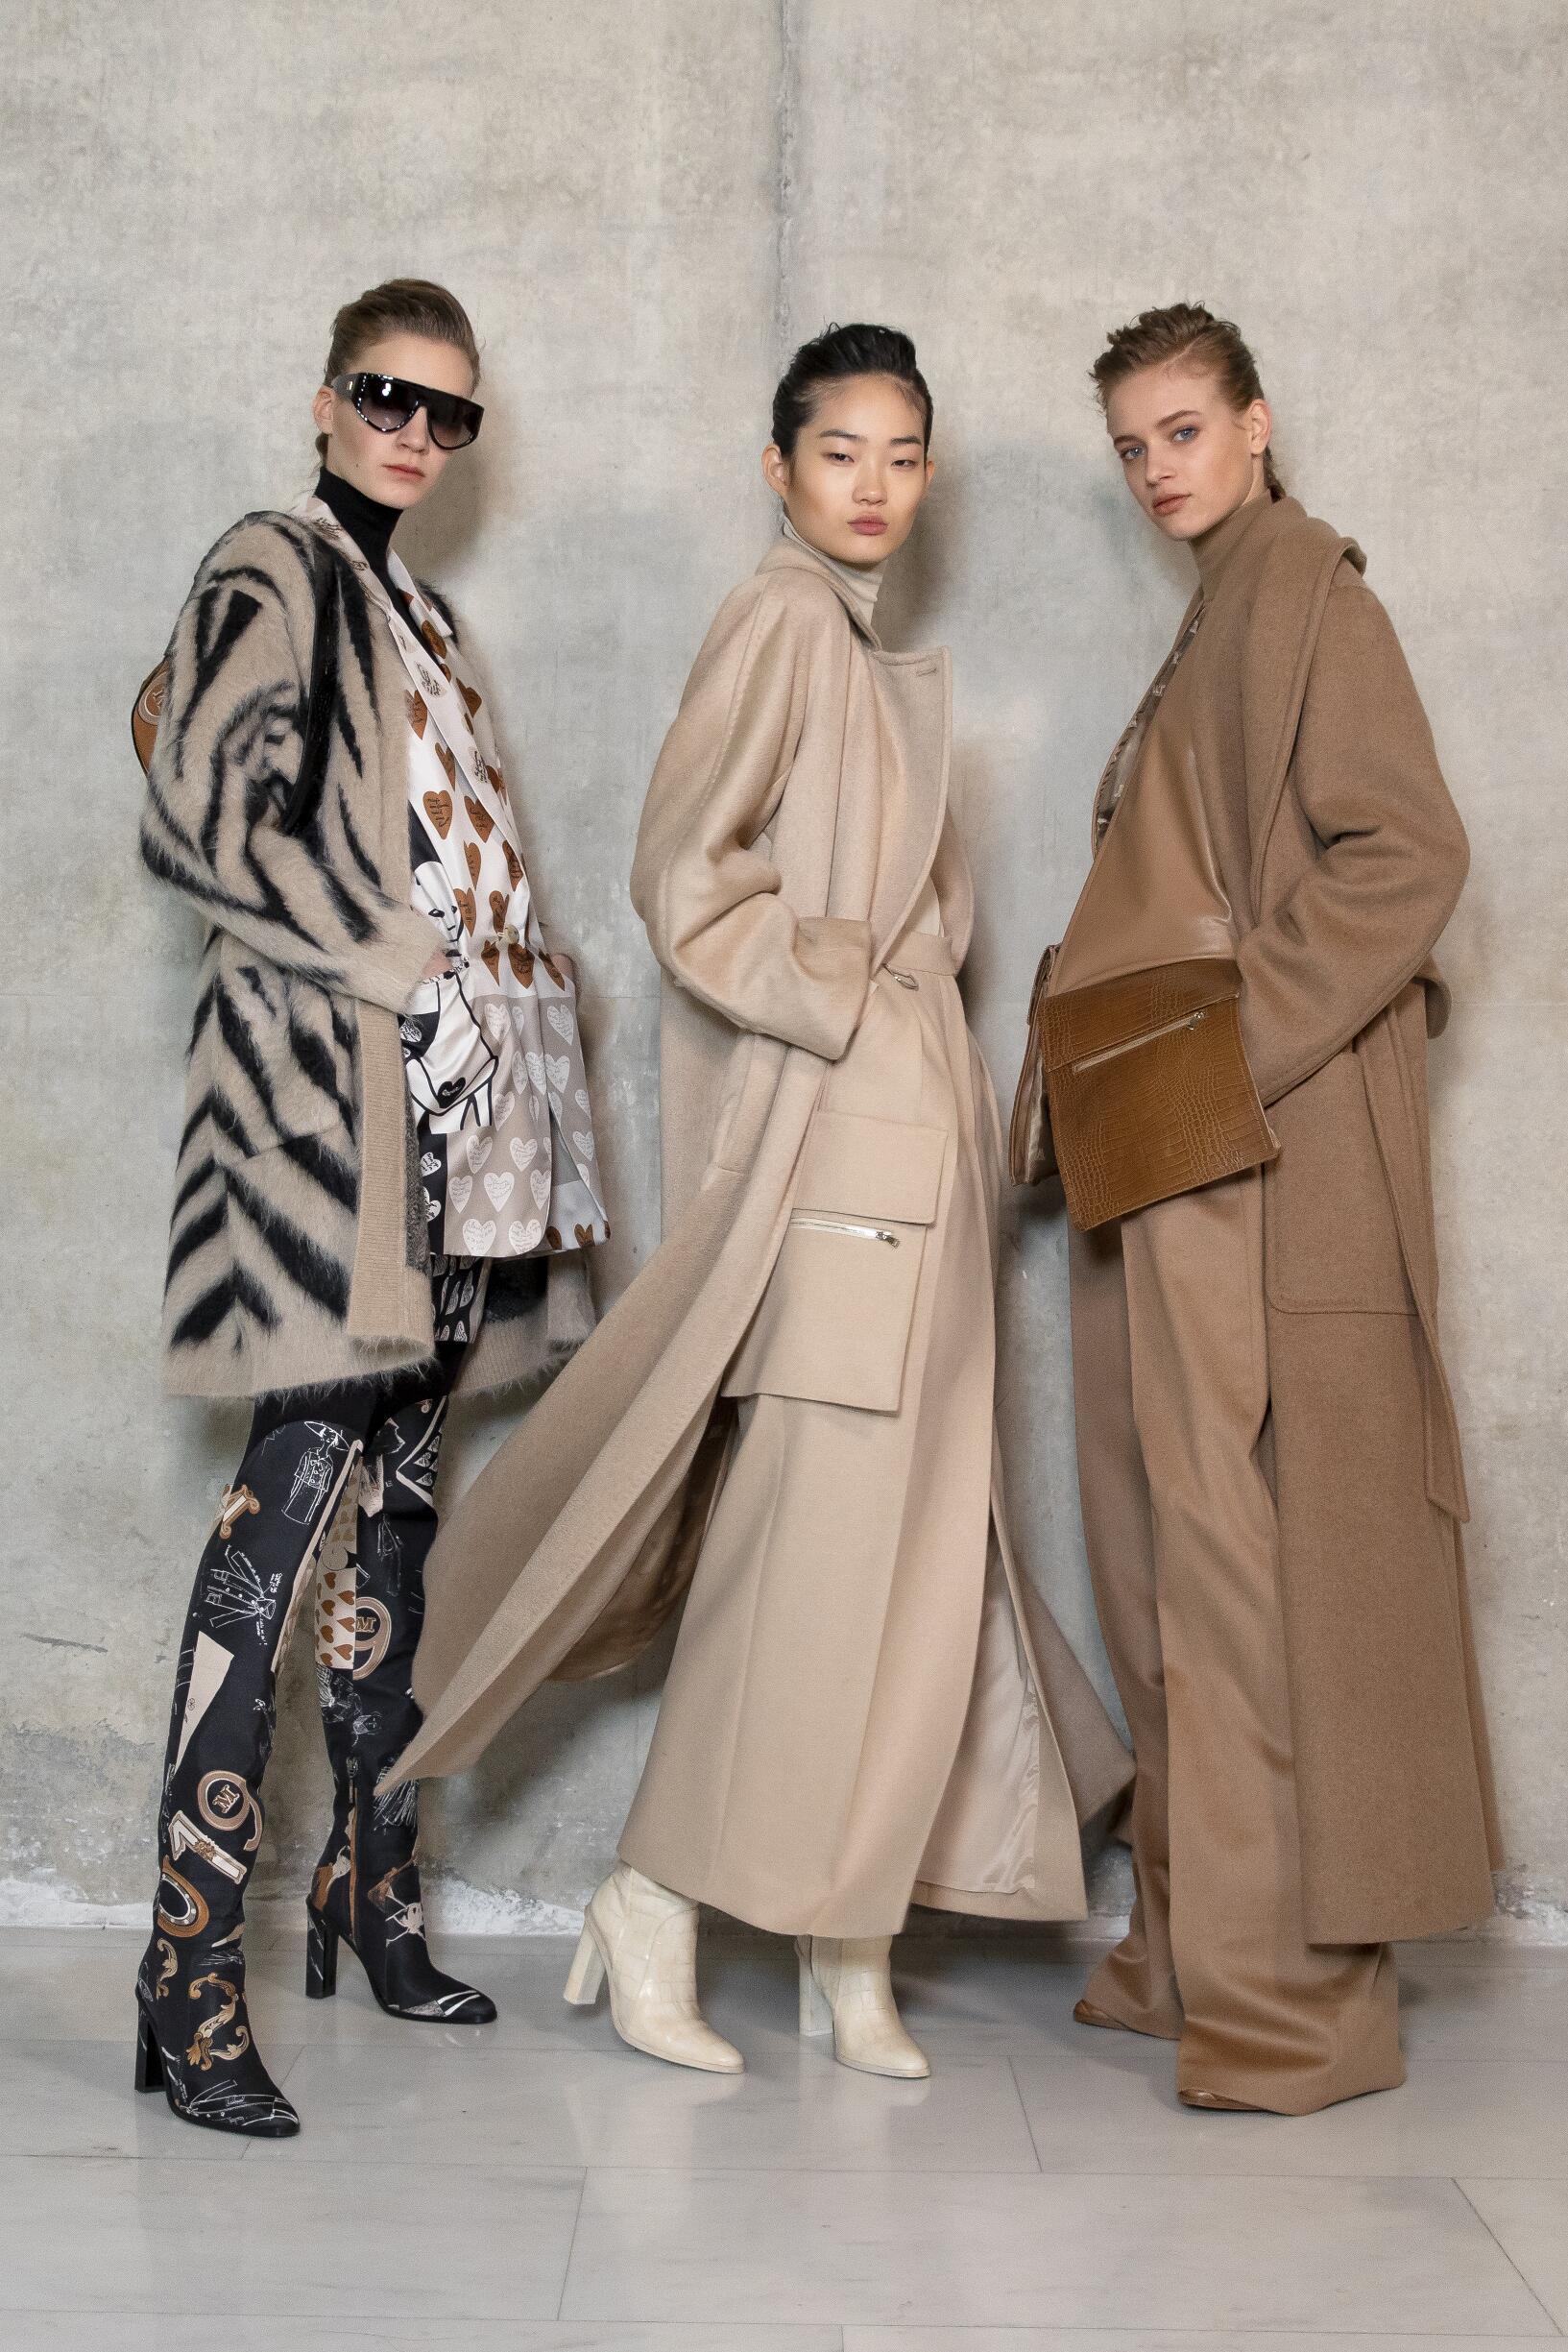 Models 2019 Fashion Backstage Max Mara